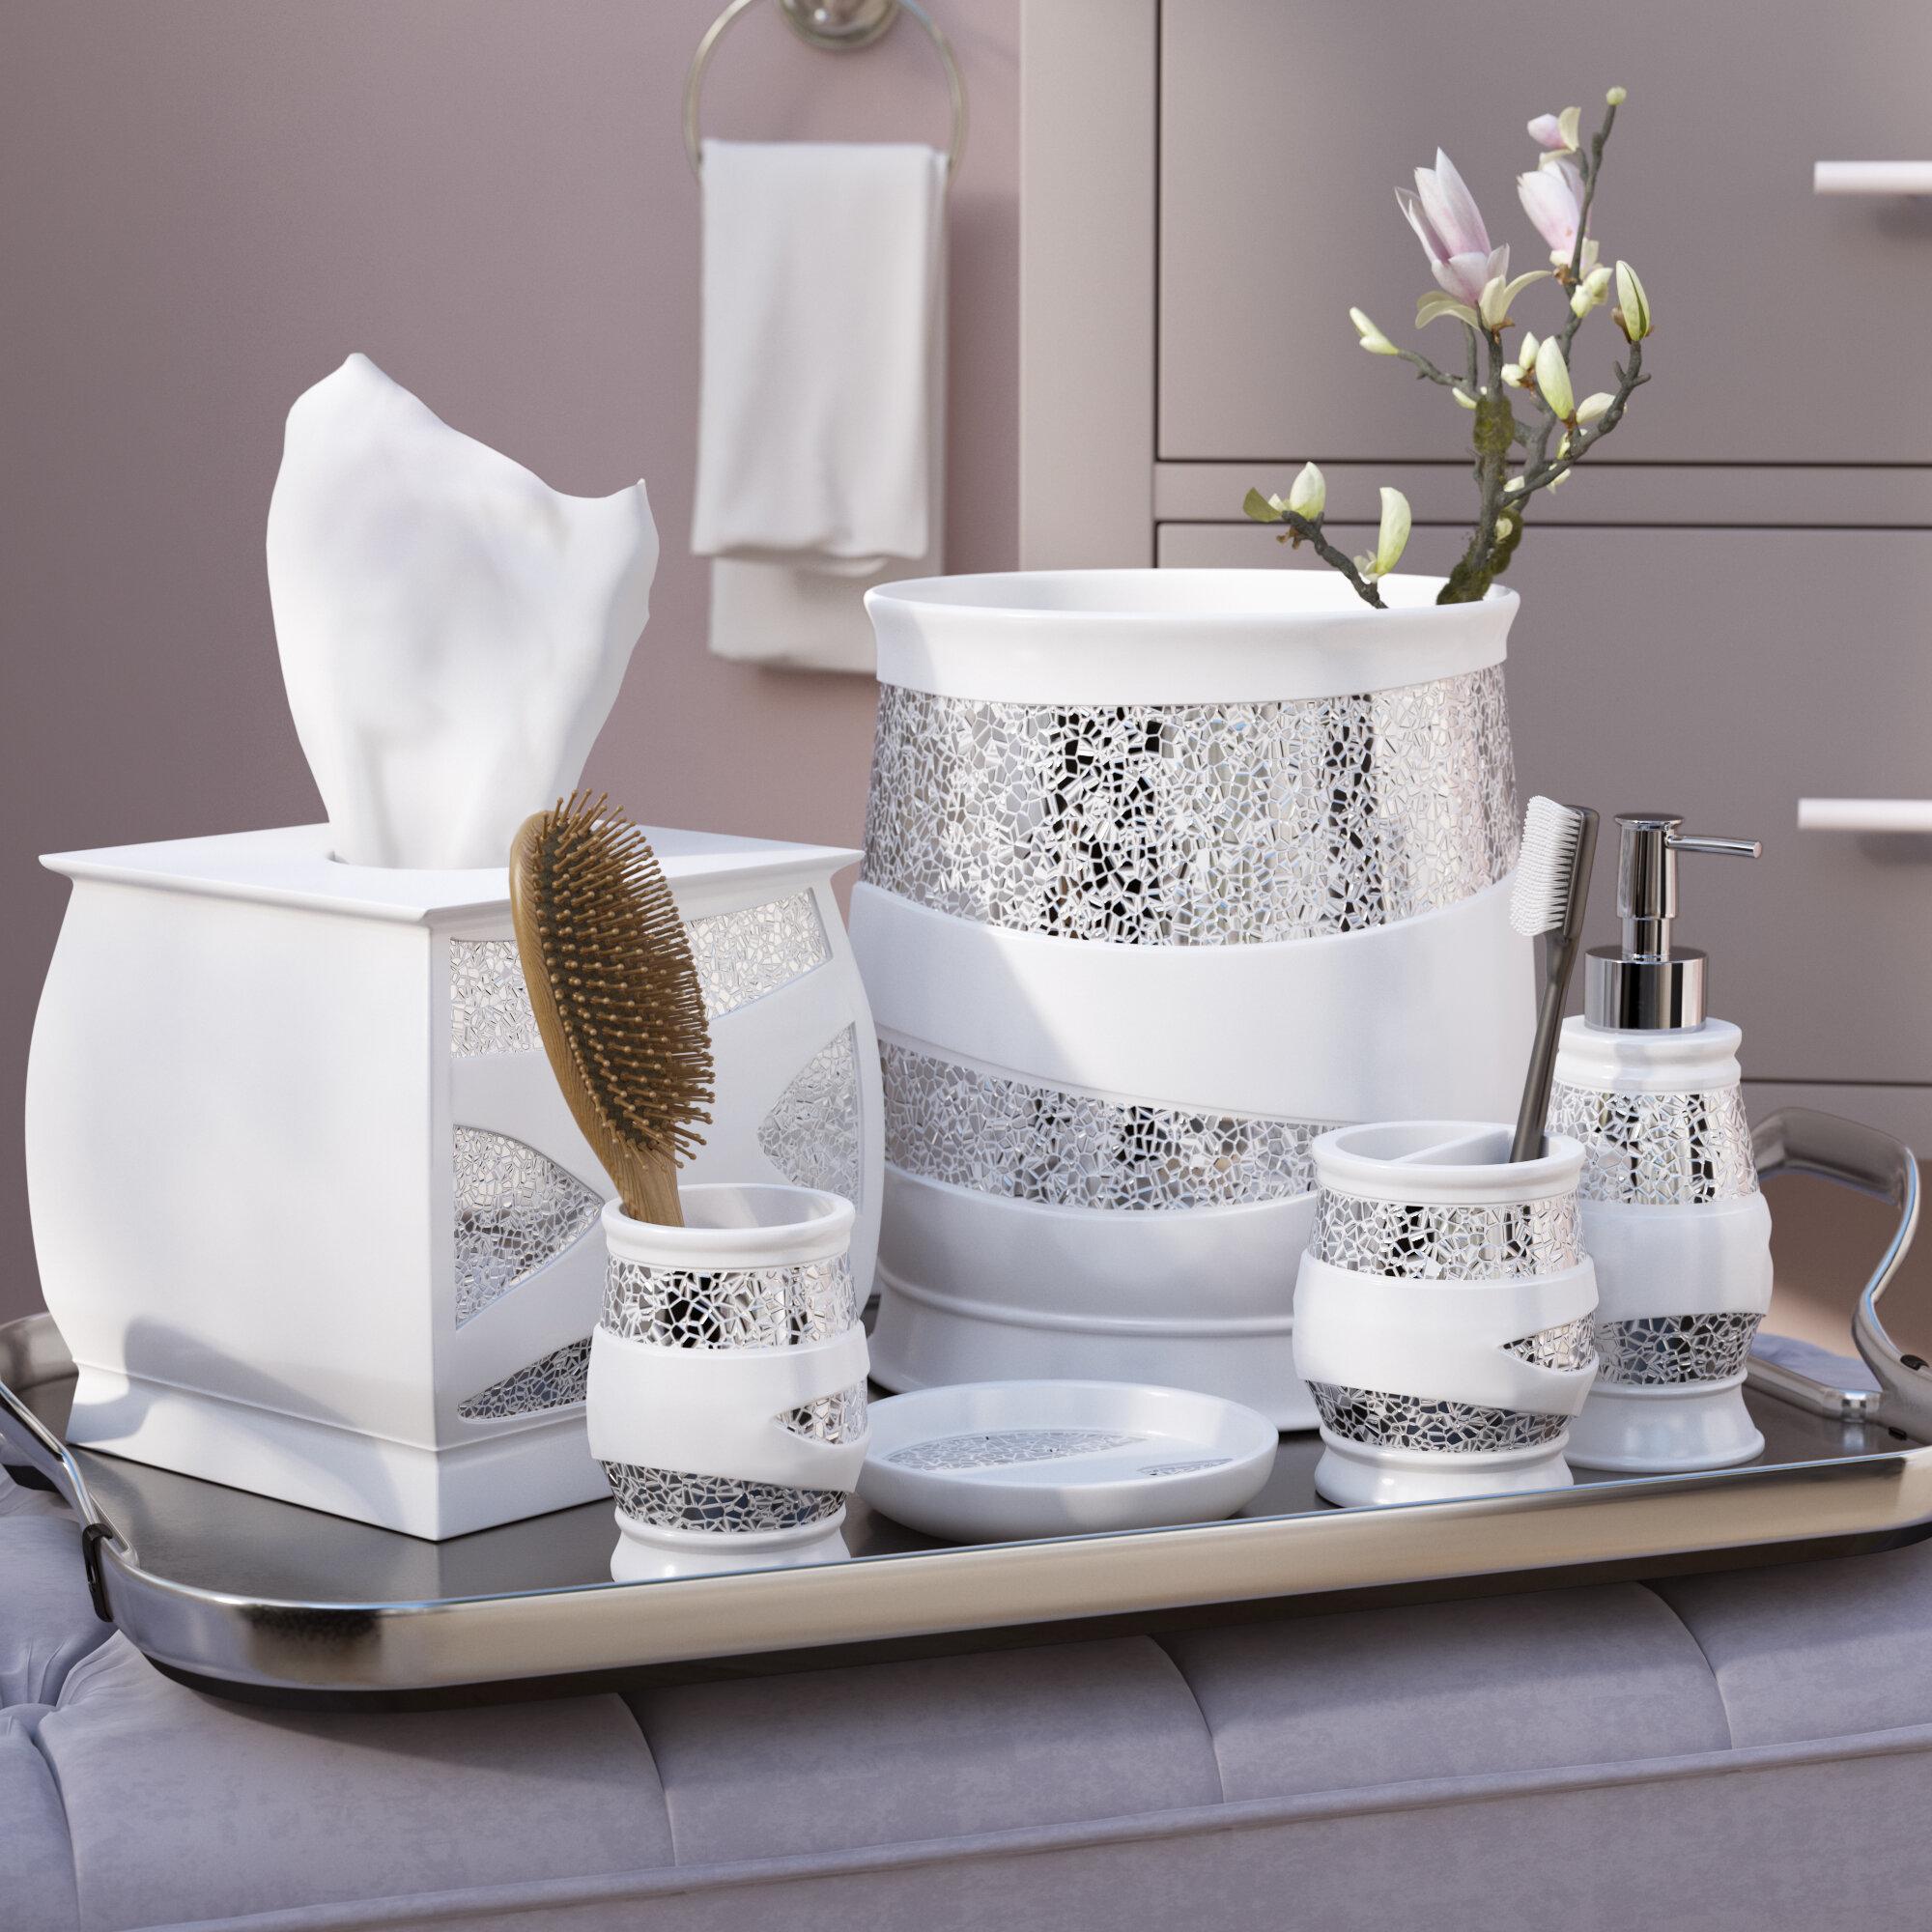 Genial Willa Arlo Interiors Rivet 6 Piece White/Silver Bathroom Accessory Set U0026  Reviews | Wayfair